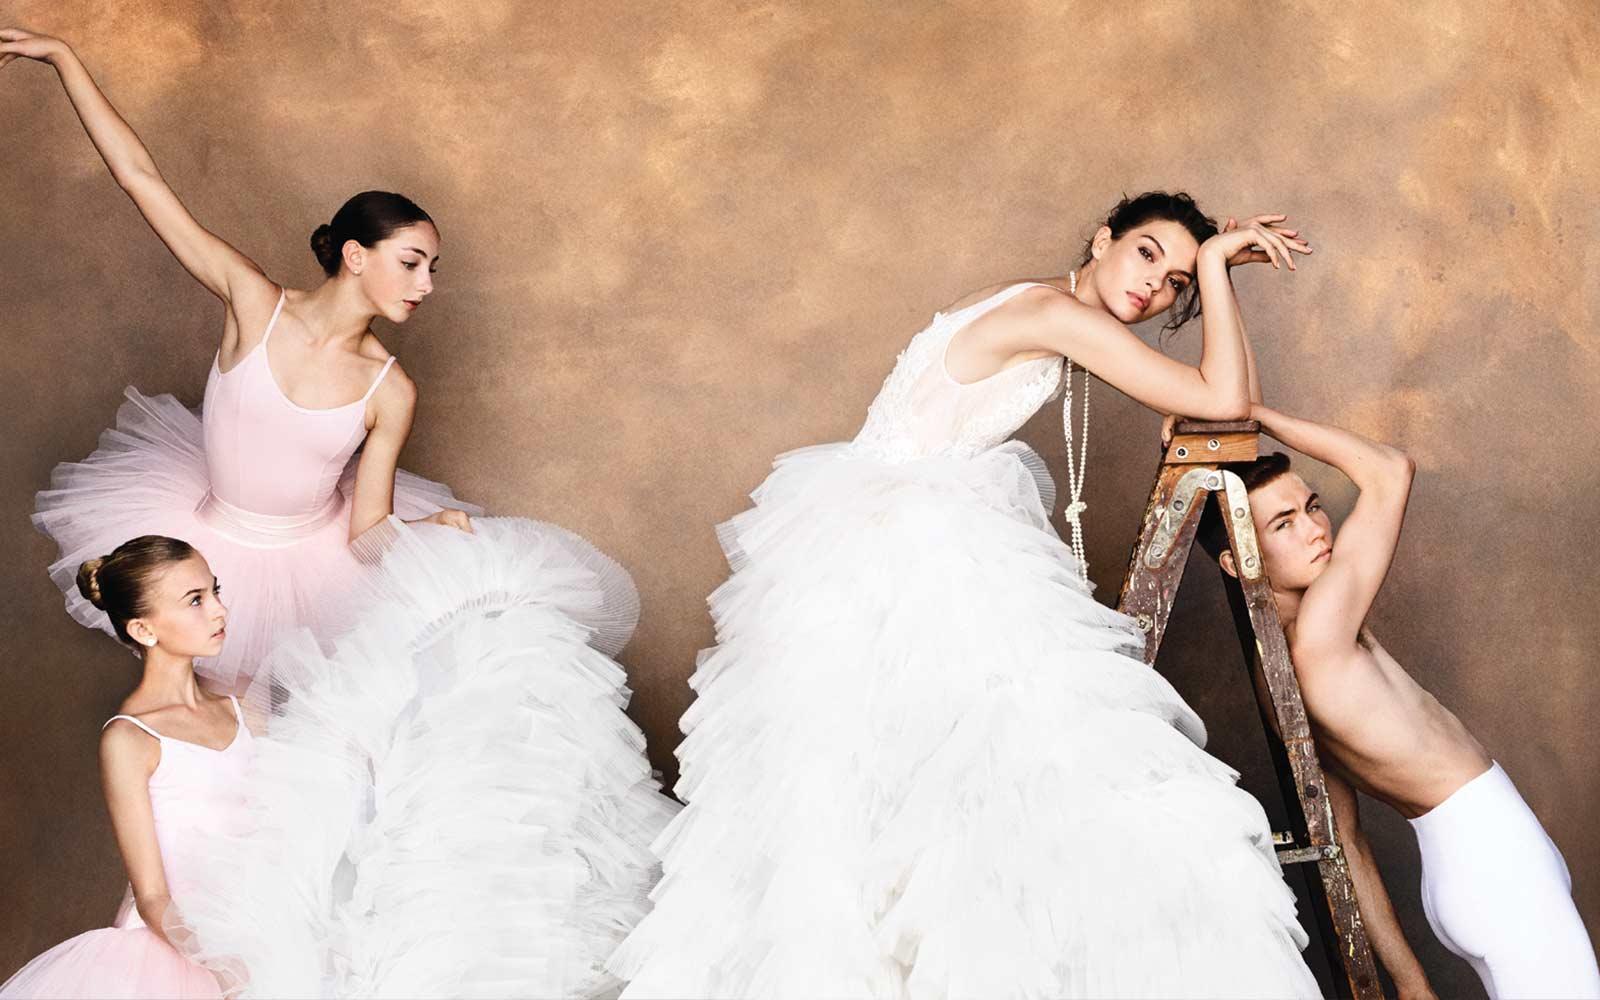 Brides of Houston - Rivini Trunk Show at Ivory Bridal Atelier in Houston